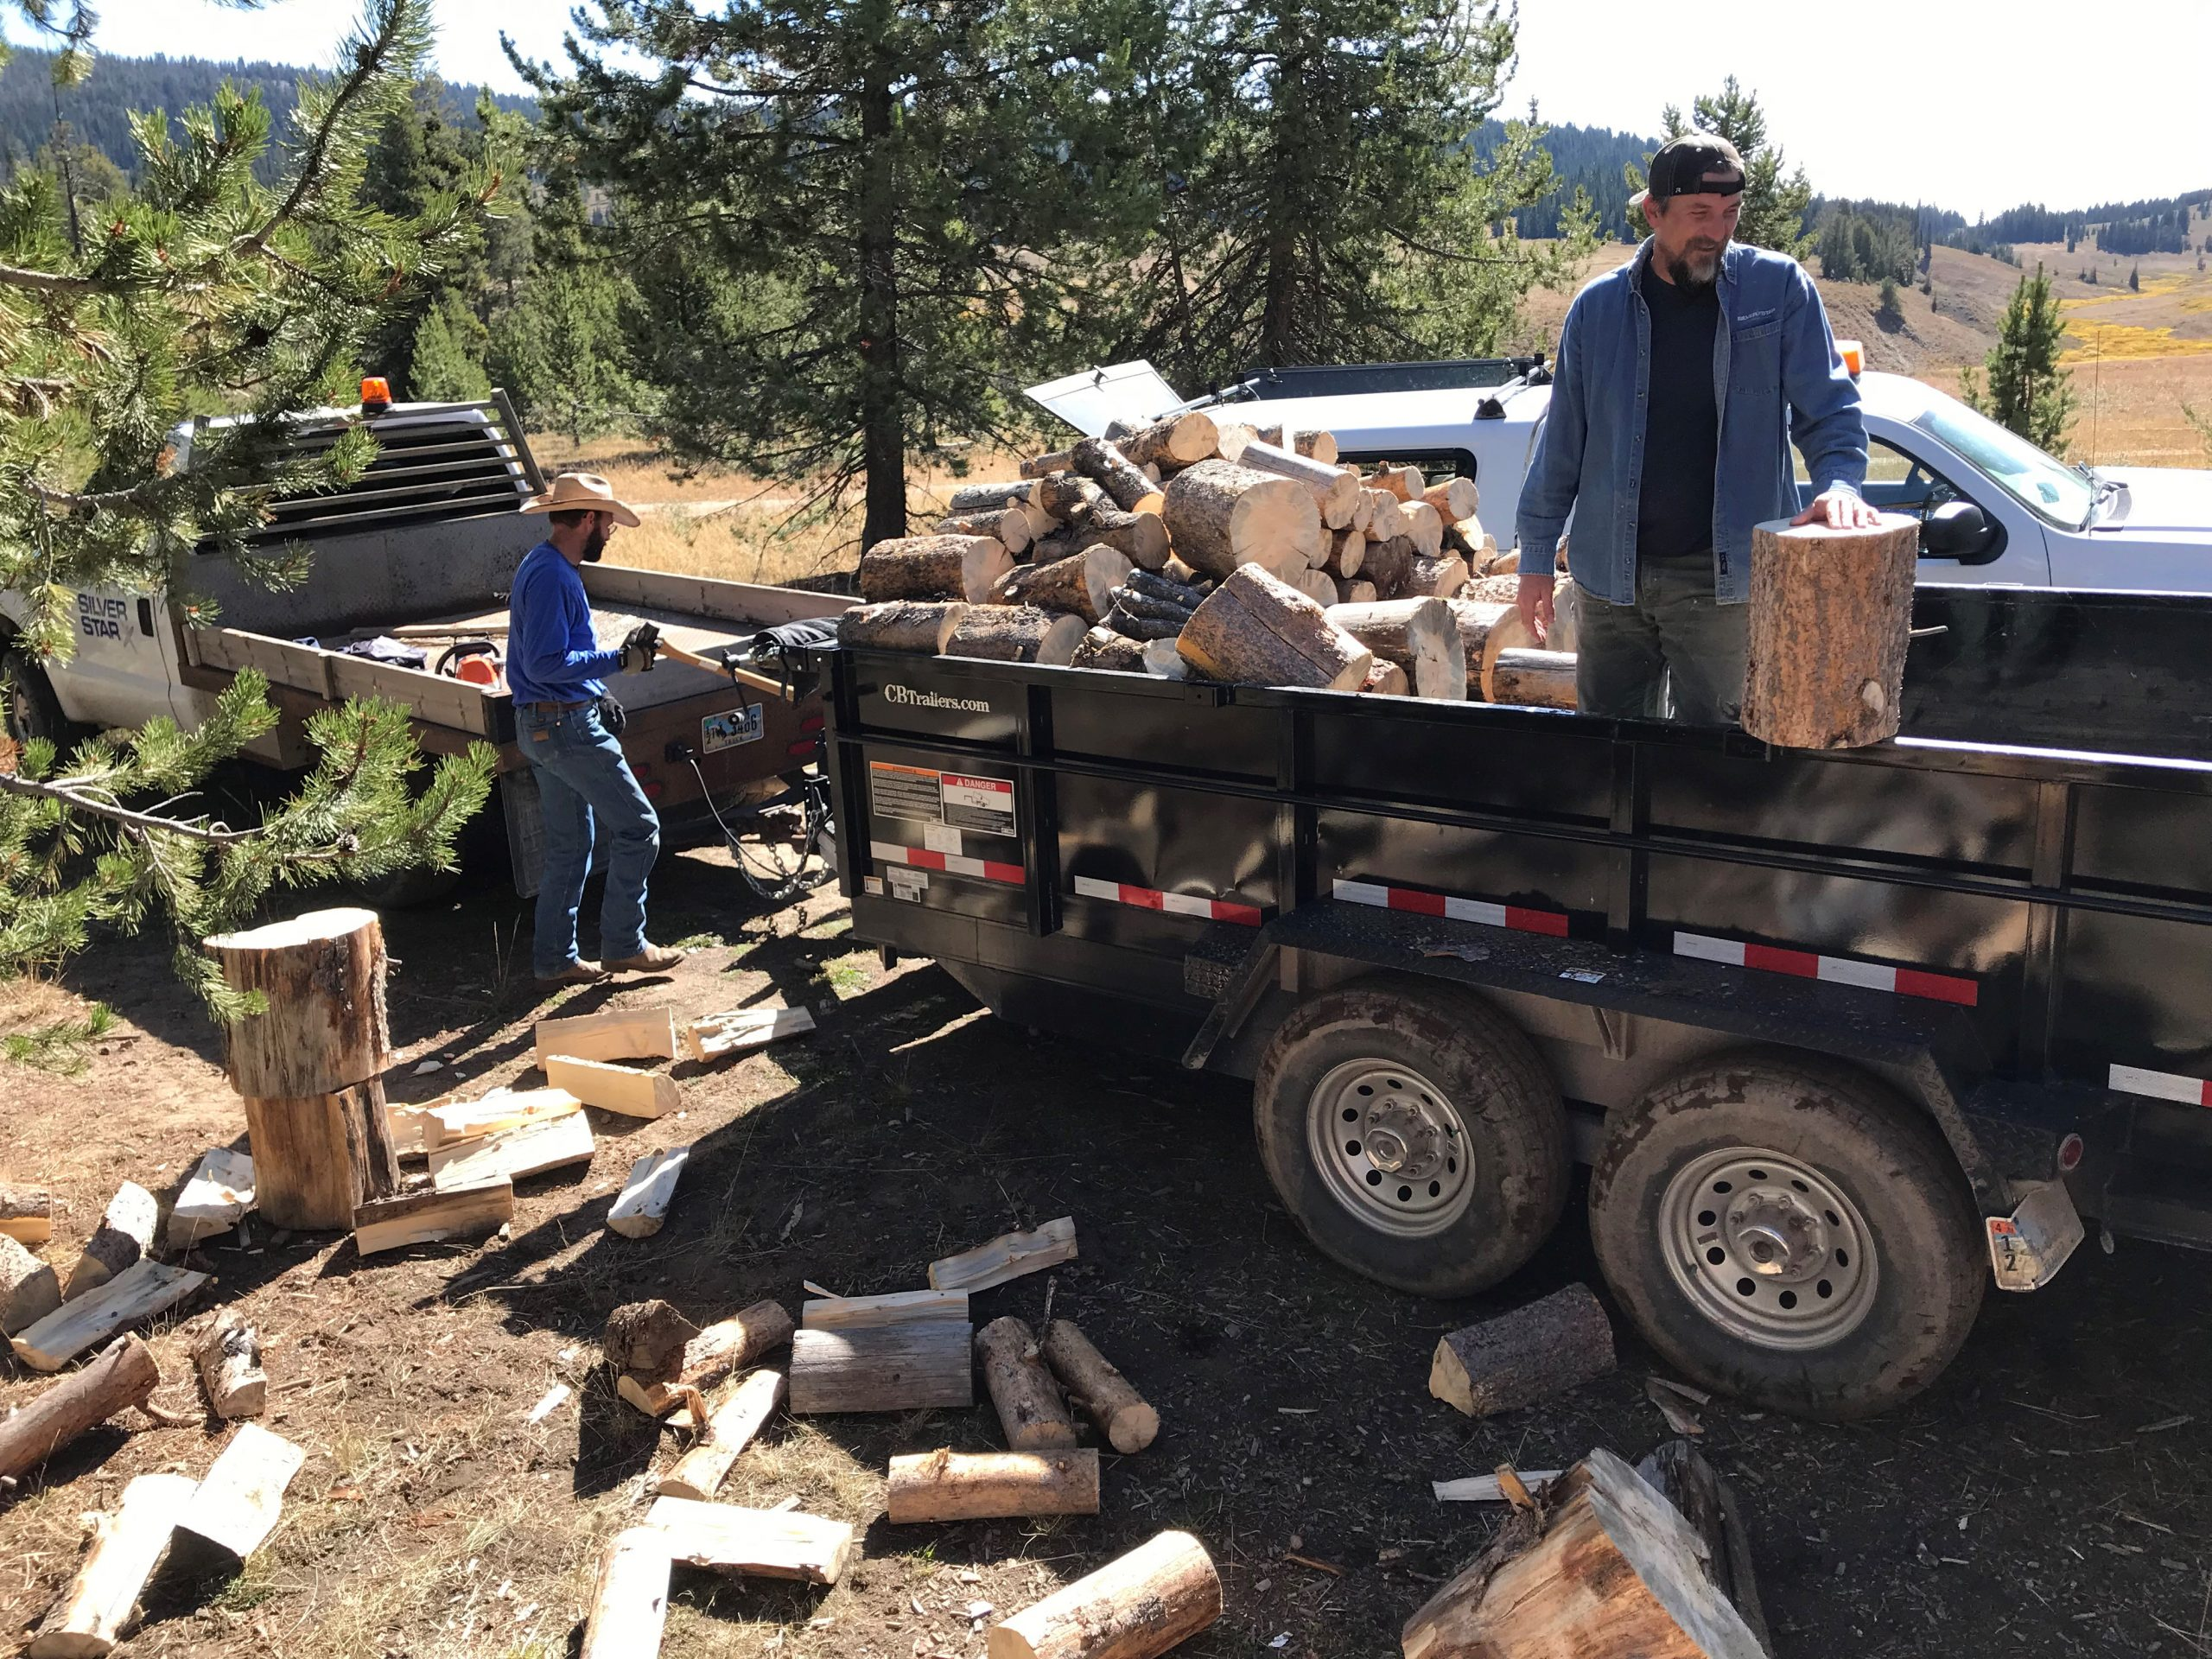 Silver Star Team Members load firewood